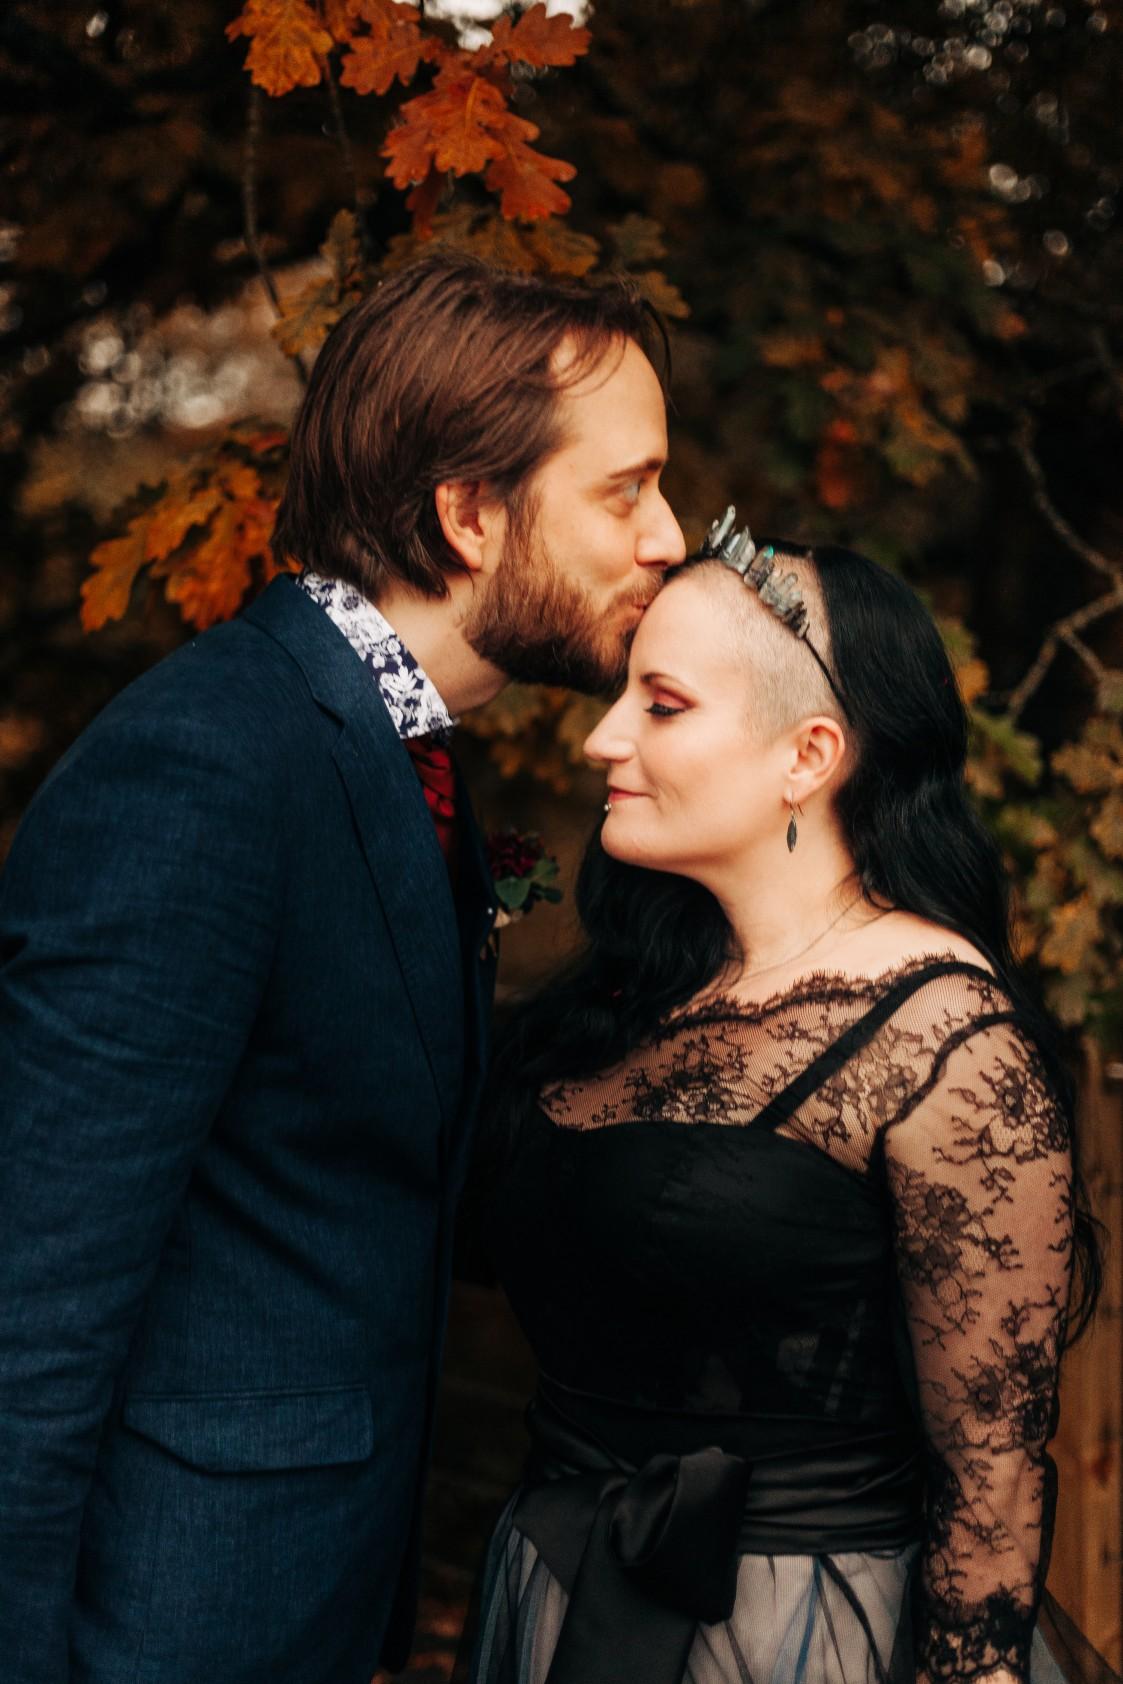 intimate alternative wedding - alternative micro wedding - small wedding photography - alternative wedding inspiration